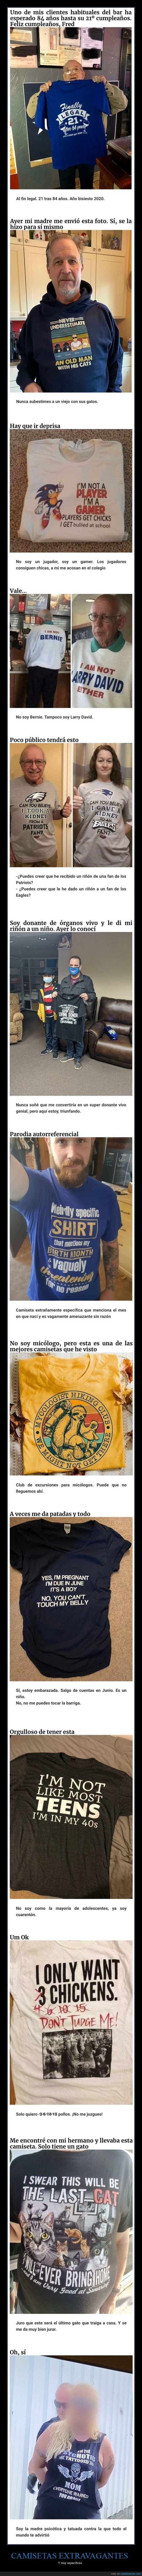 camisetas,específicas,extravagantes